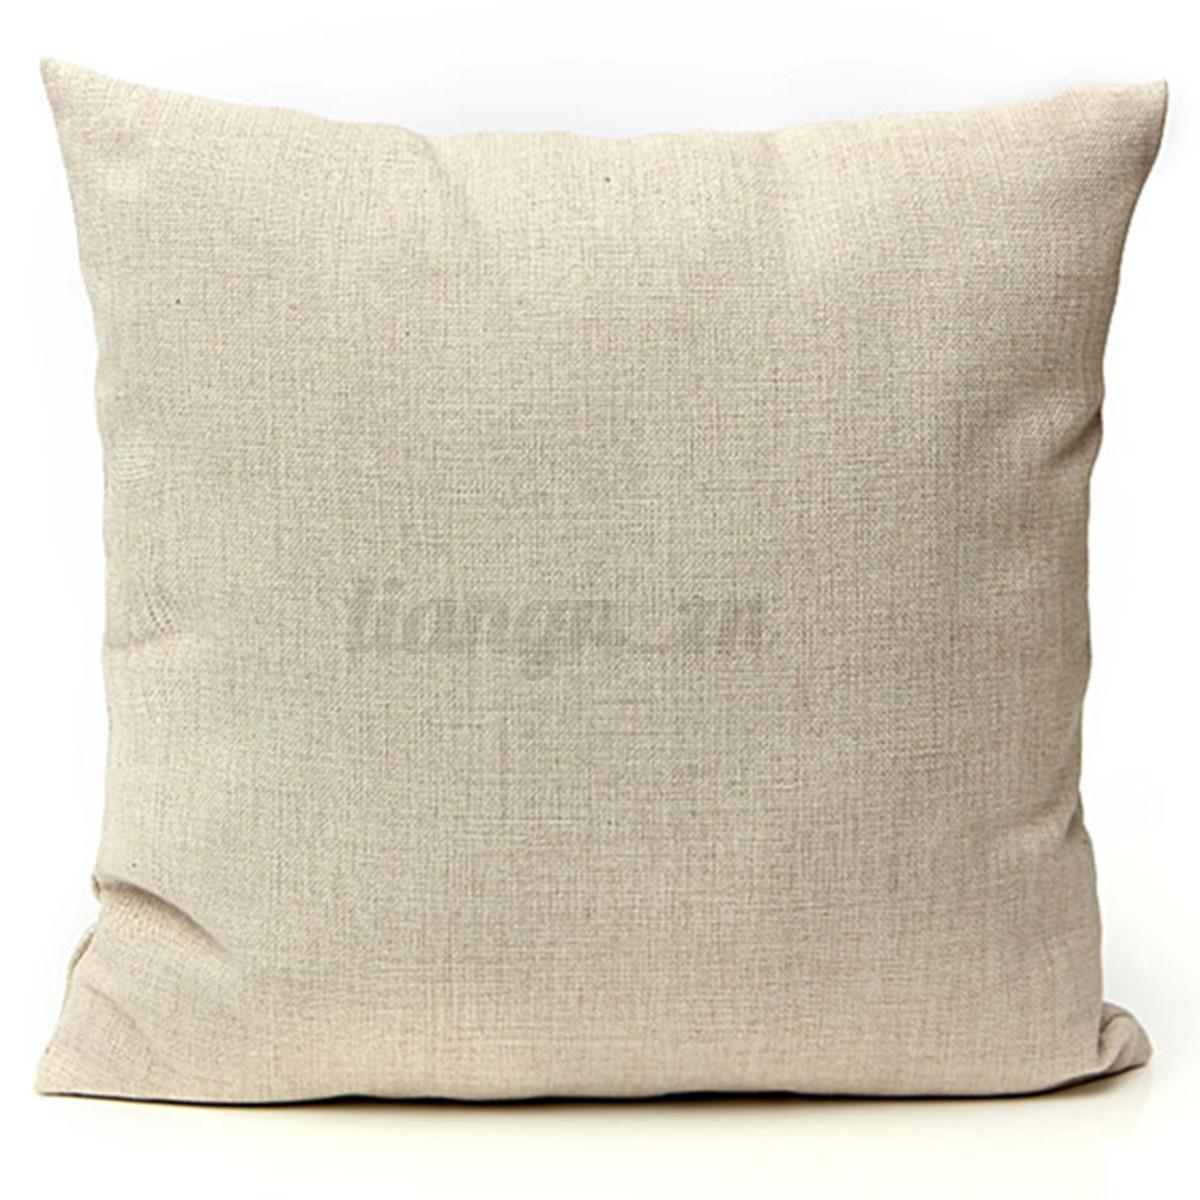 vintage ananas housse de coussin taie d 39 oreiller canap voiture cushion cover ebay. Black Bedroom Furniture Sets. Home Design Ideas